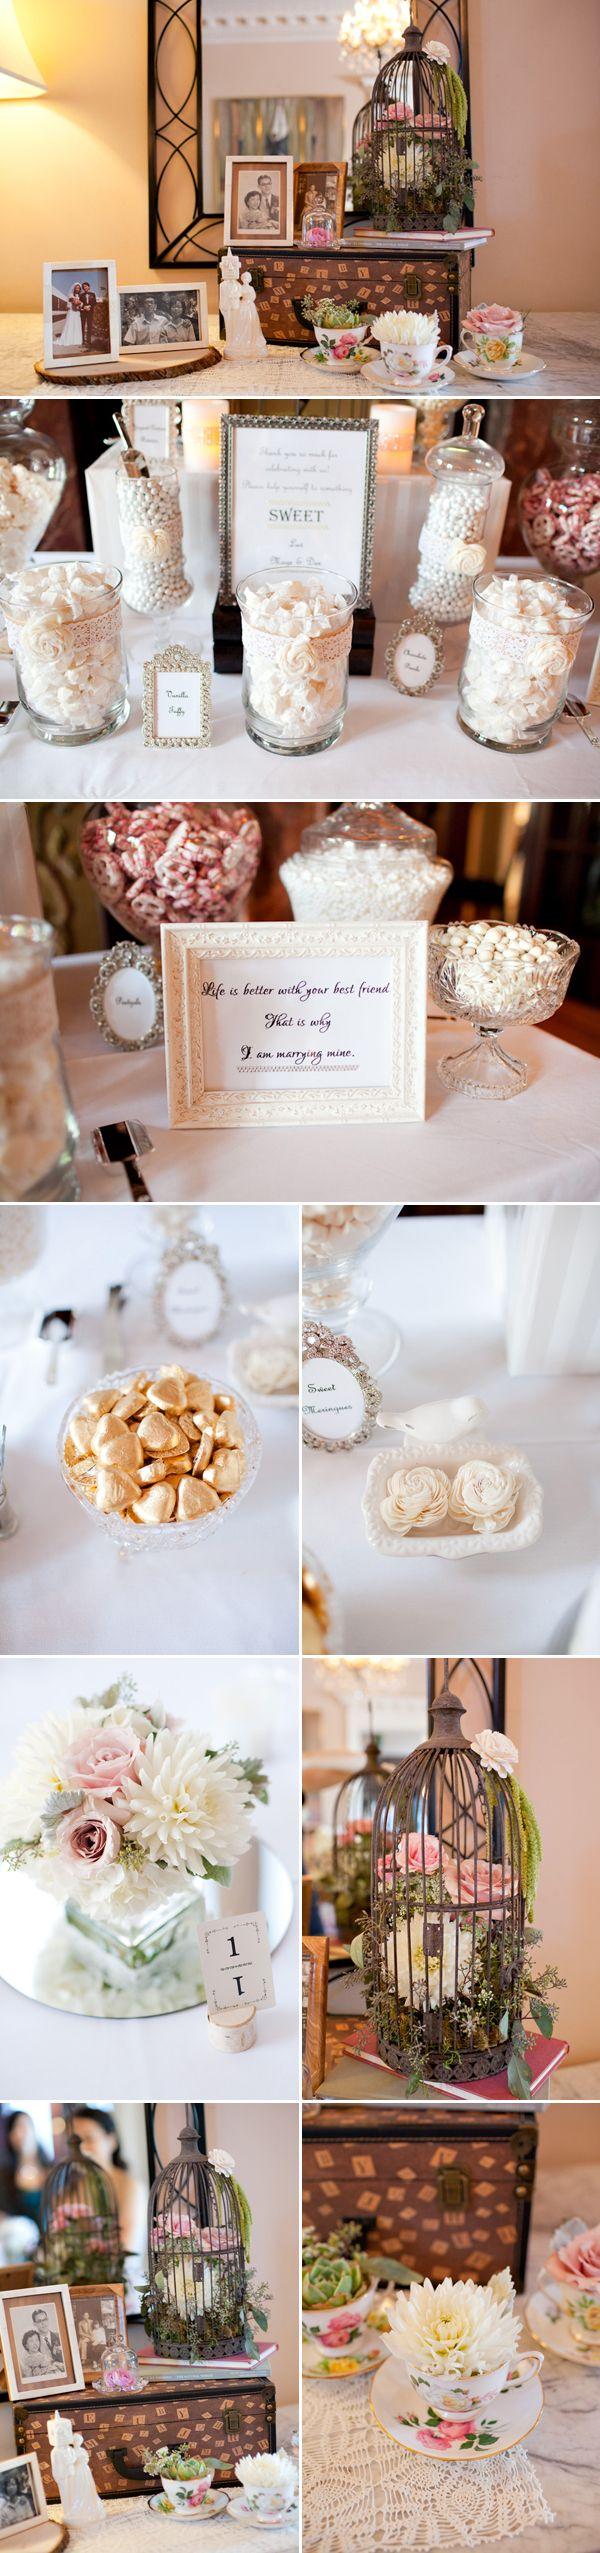 White and Gold Wedding. A Romantic Vintage Wedding – Maggie & Haydex